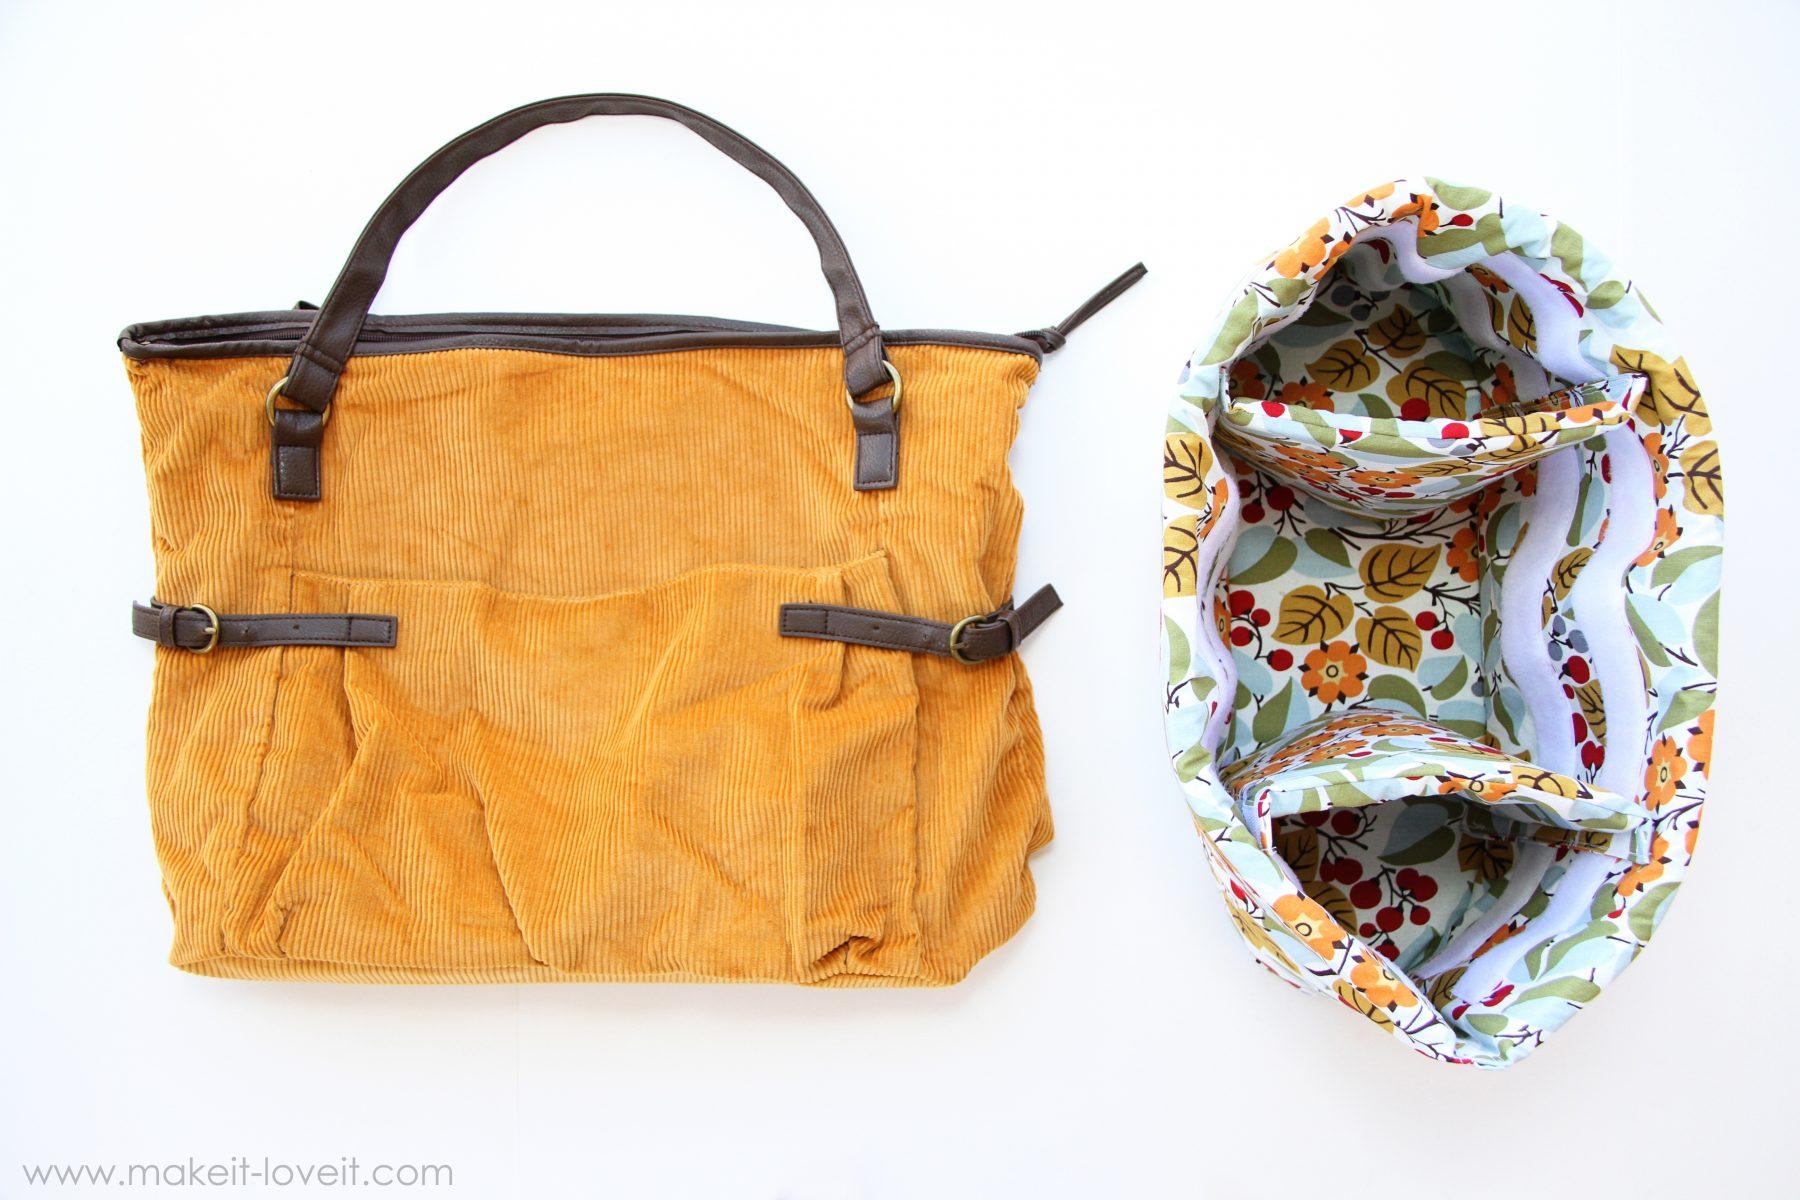 Turn a purse into a padded camera bag